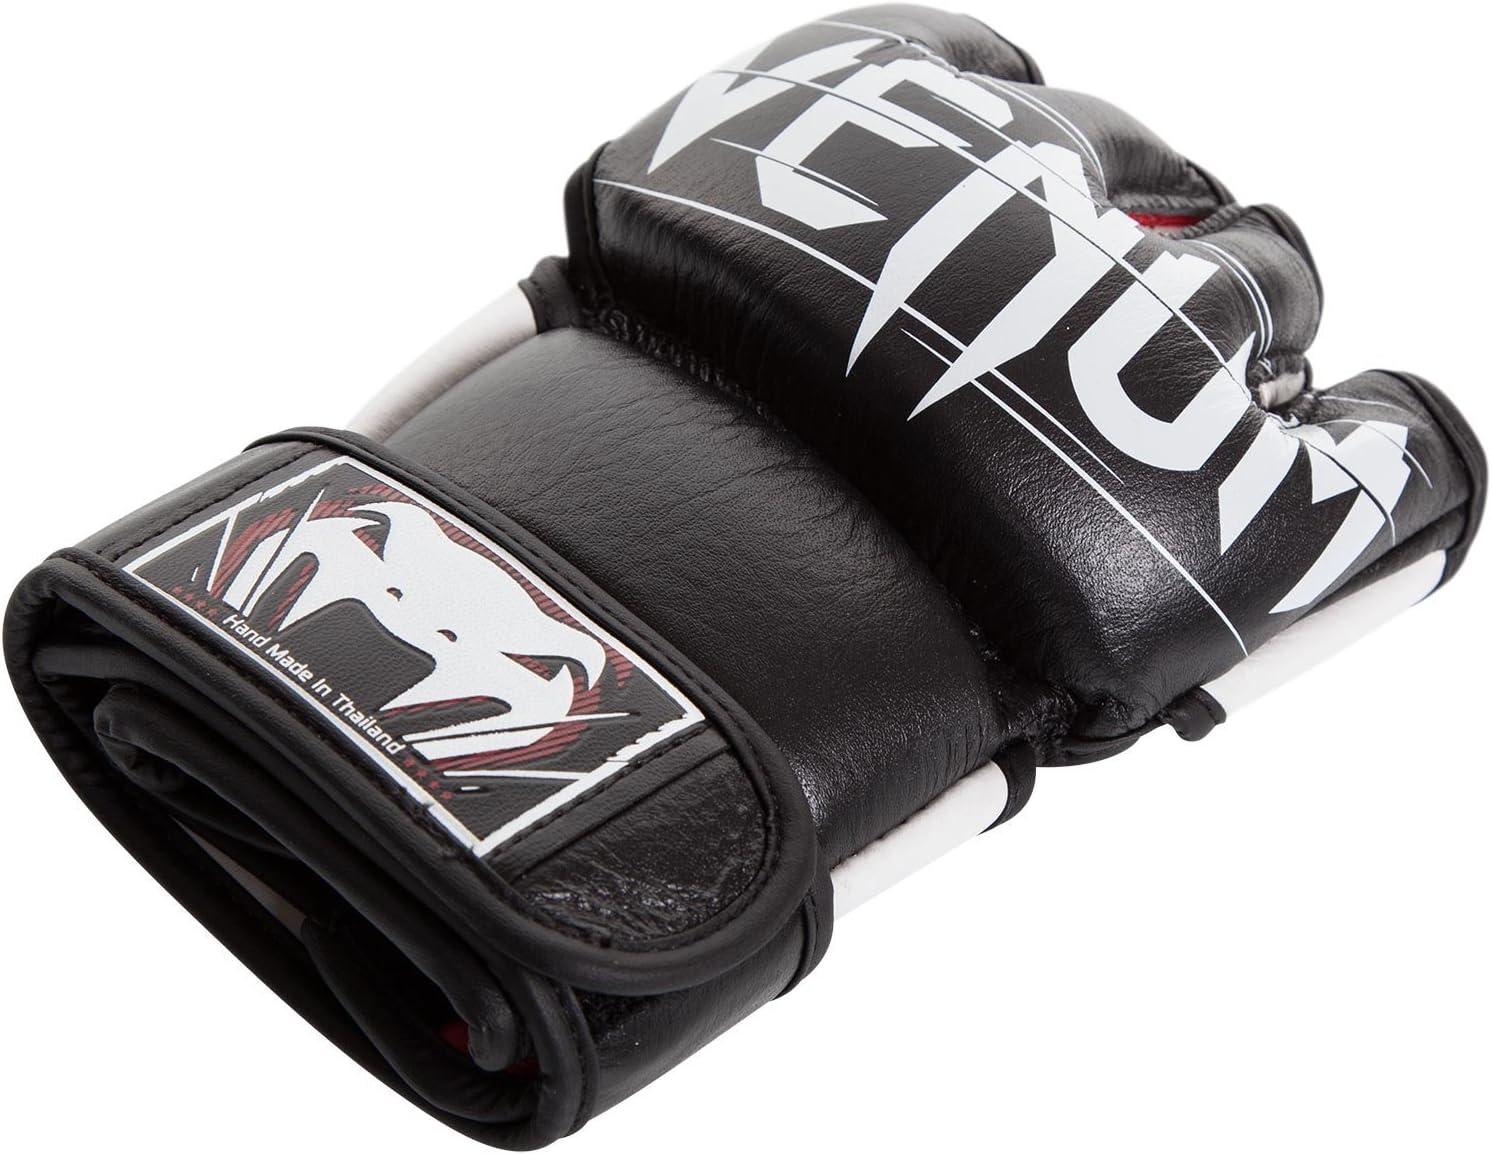 Venum Undisputed 2.0 MMA Gloves Nappa Leather Black Fight Training Martial Arts